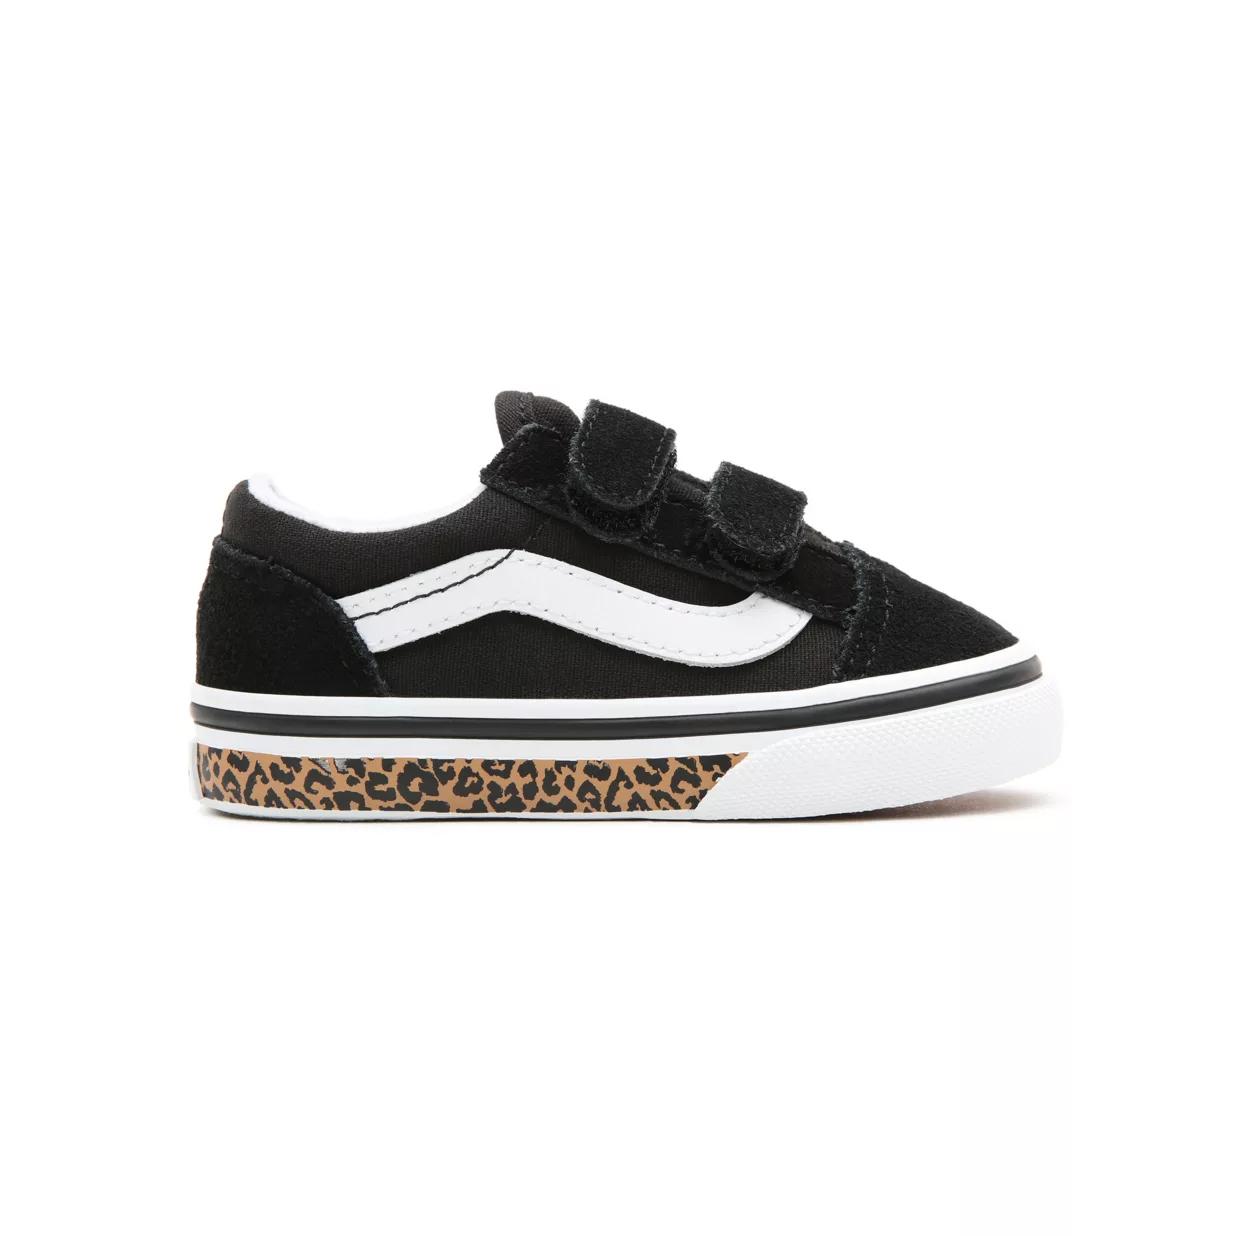 Vans Old Skool V | Animal sidewall leopard